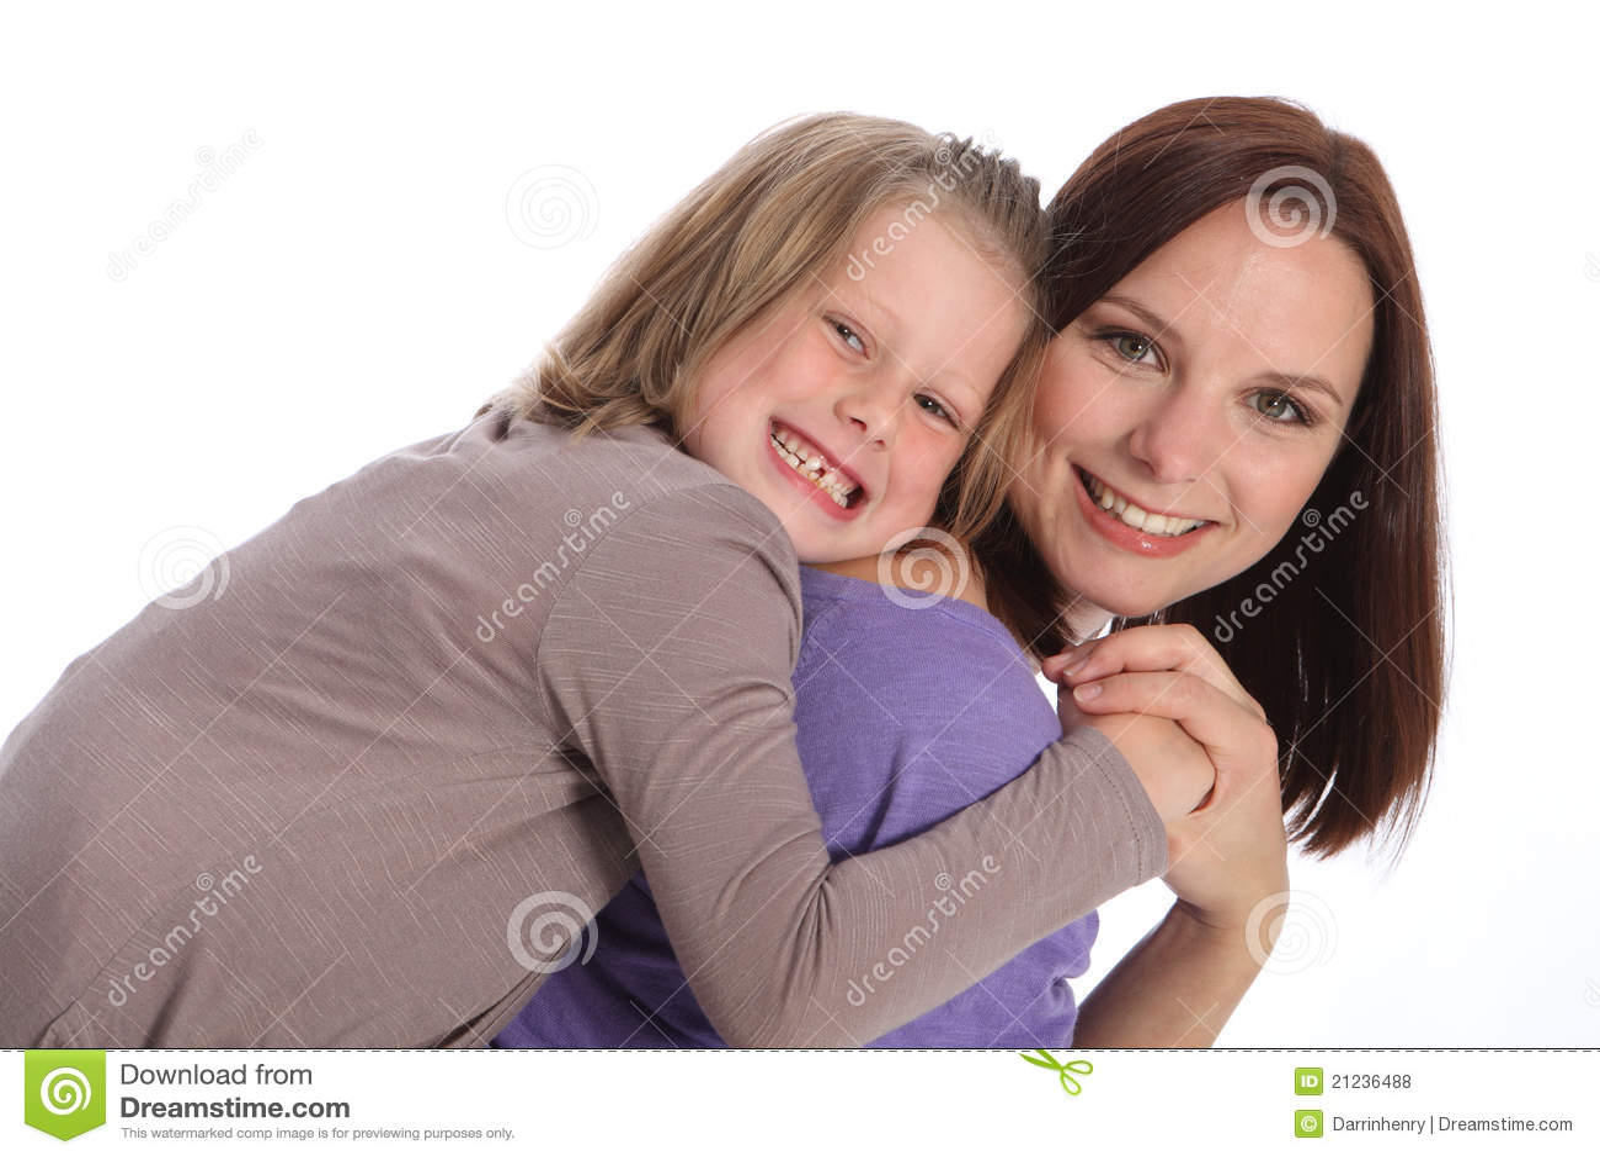 Big smiles mother and daughter piggy back fun